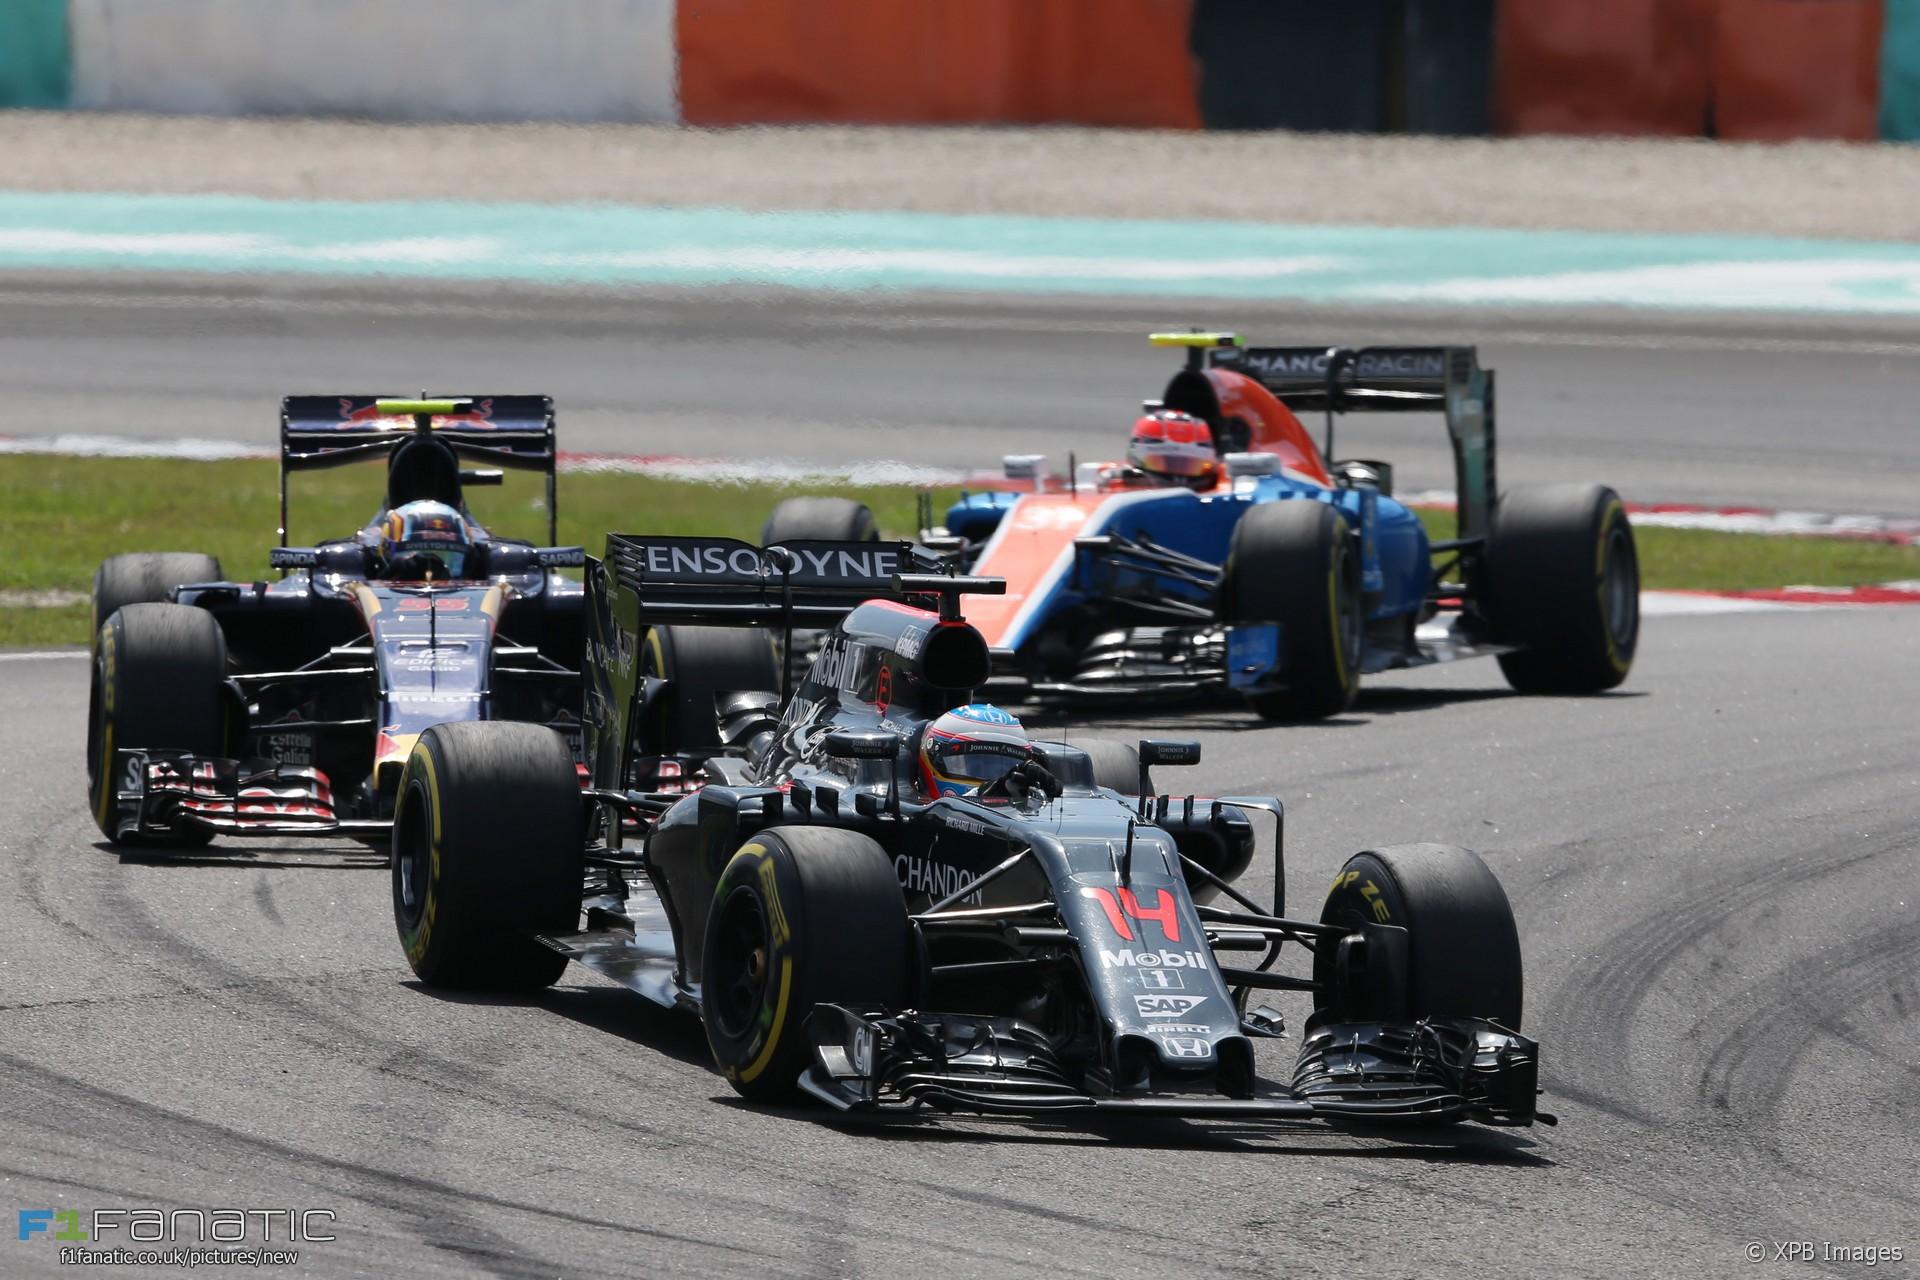 Fernando Alonso, McLaren, Sepang International Circuit, 2016